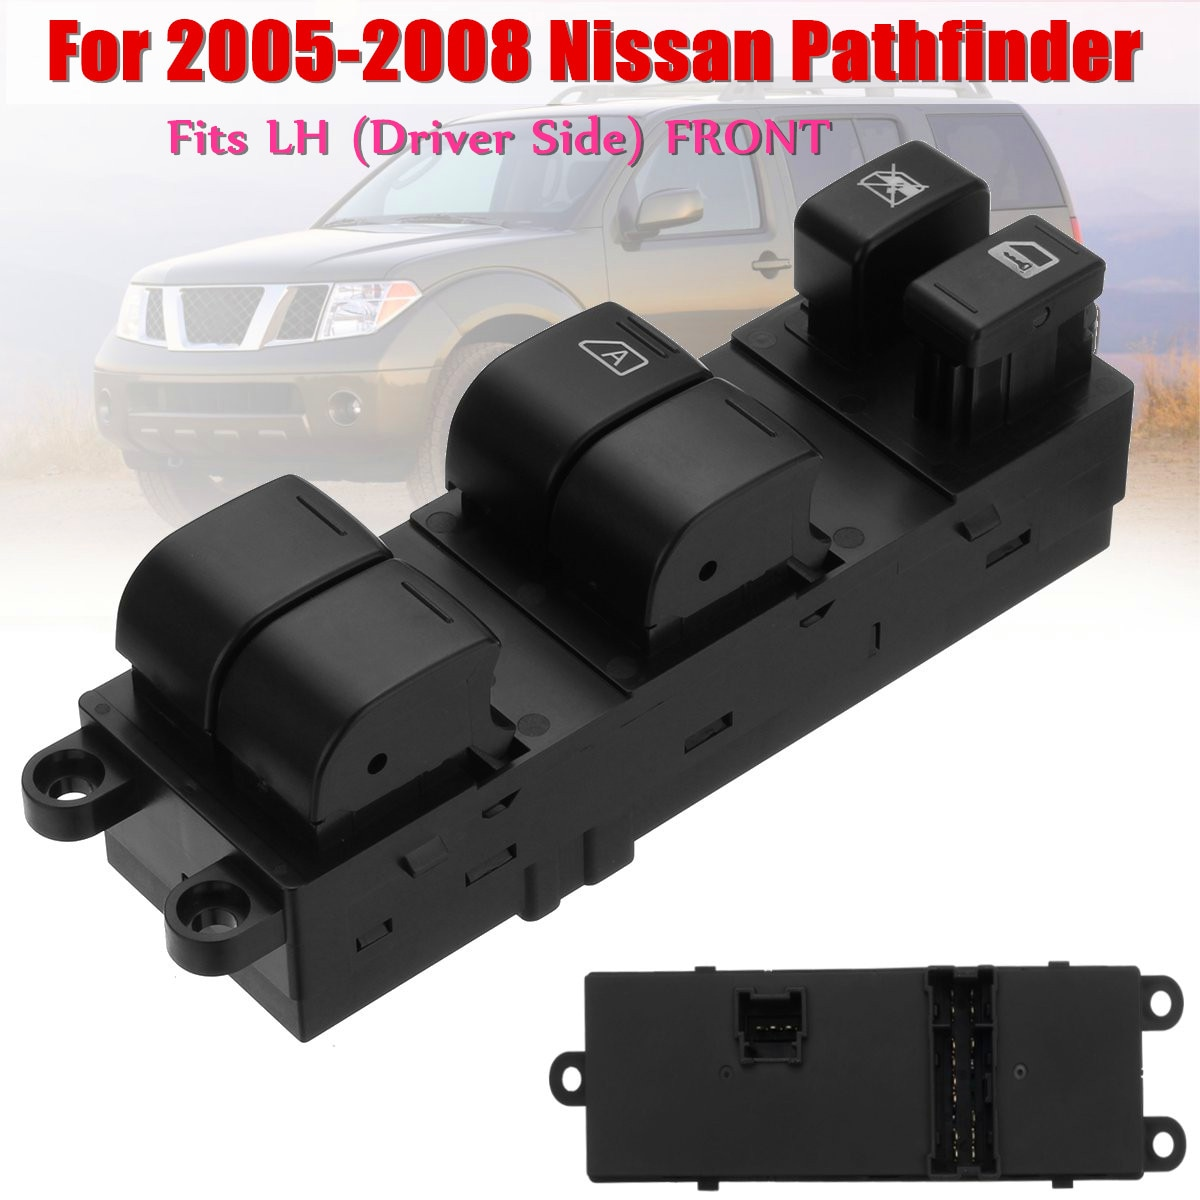 LHD eléctrico interruptor de ventanilla principal 25401-9W100 25401-ZP40B 254019W100 25401ZP40B para Nissan Pathfinder 4.0L 5.6L 2005-2008